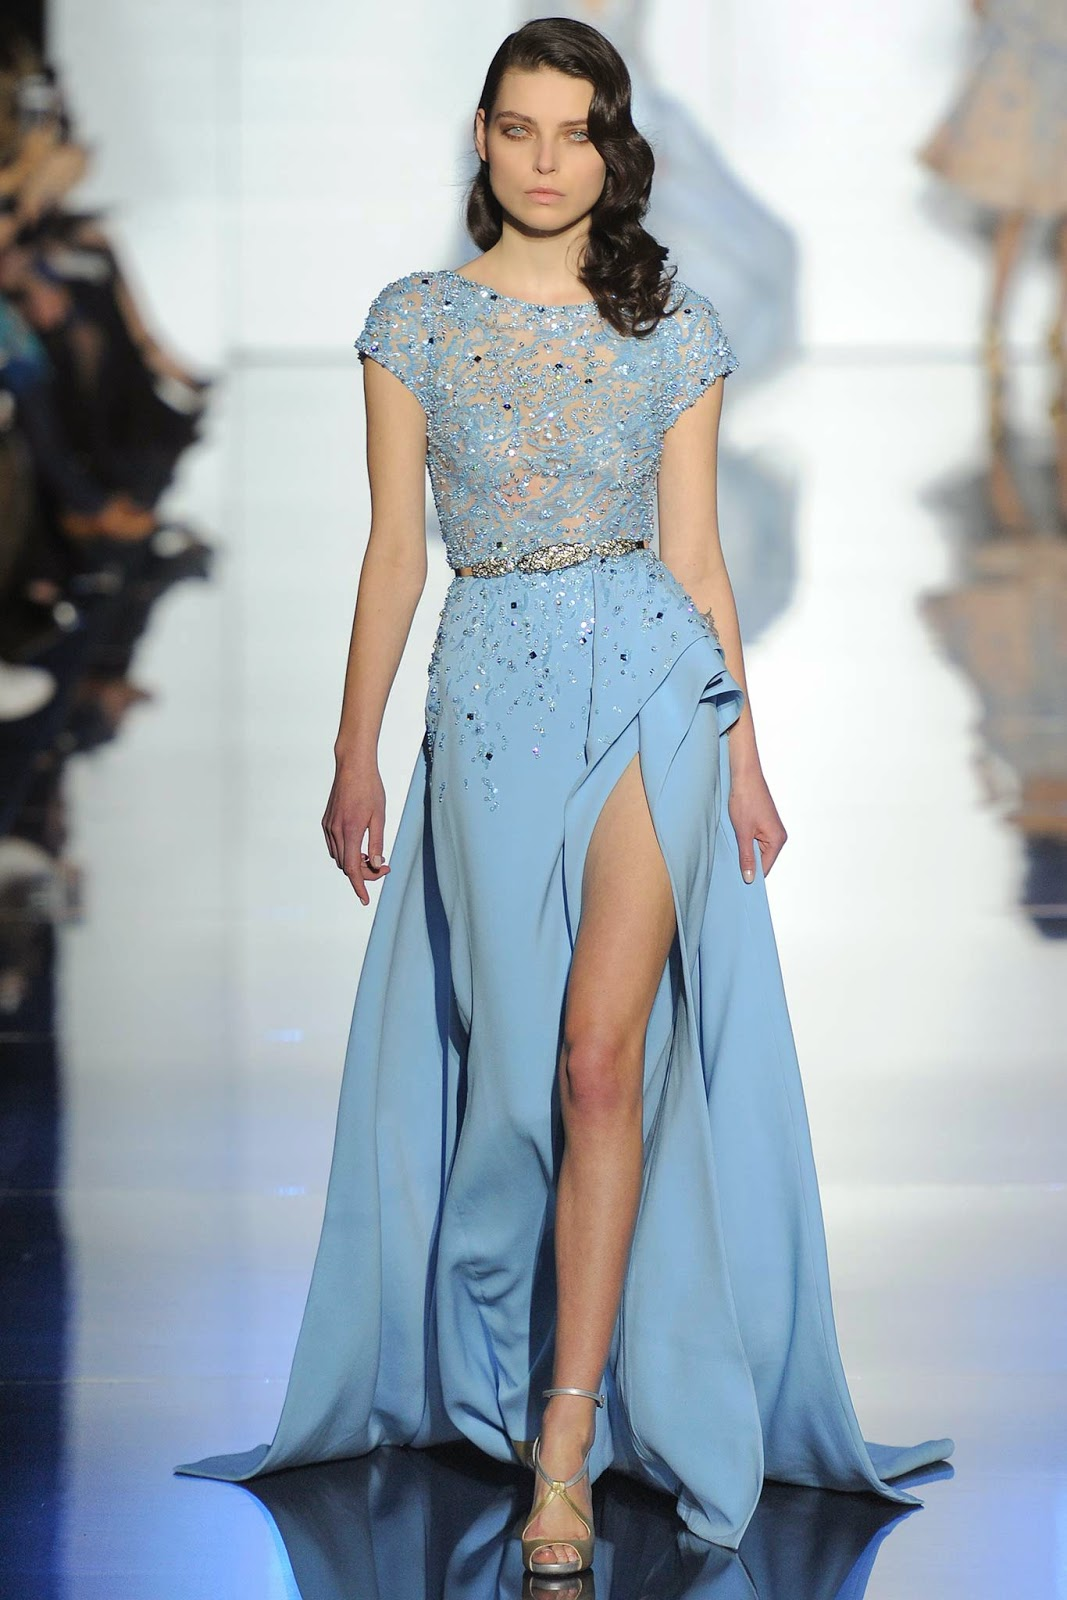 fashioncollectiontrend: Zuhair Murad 2015 Kollektion ...